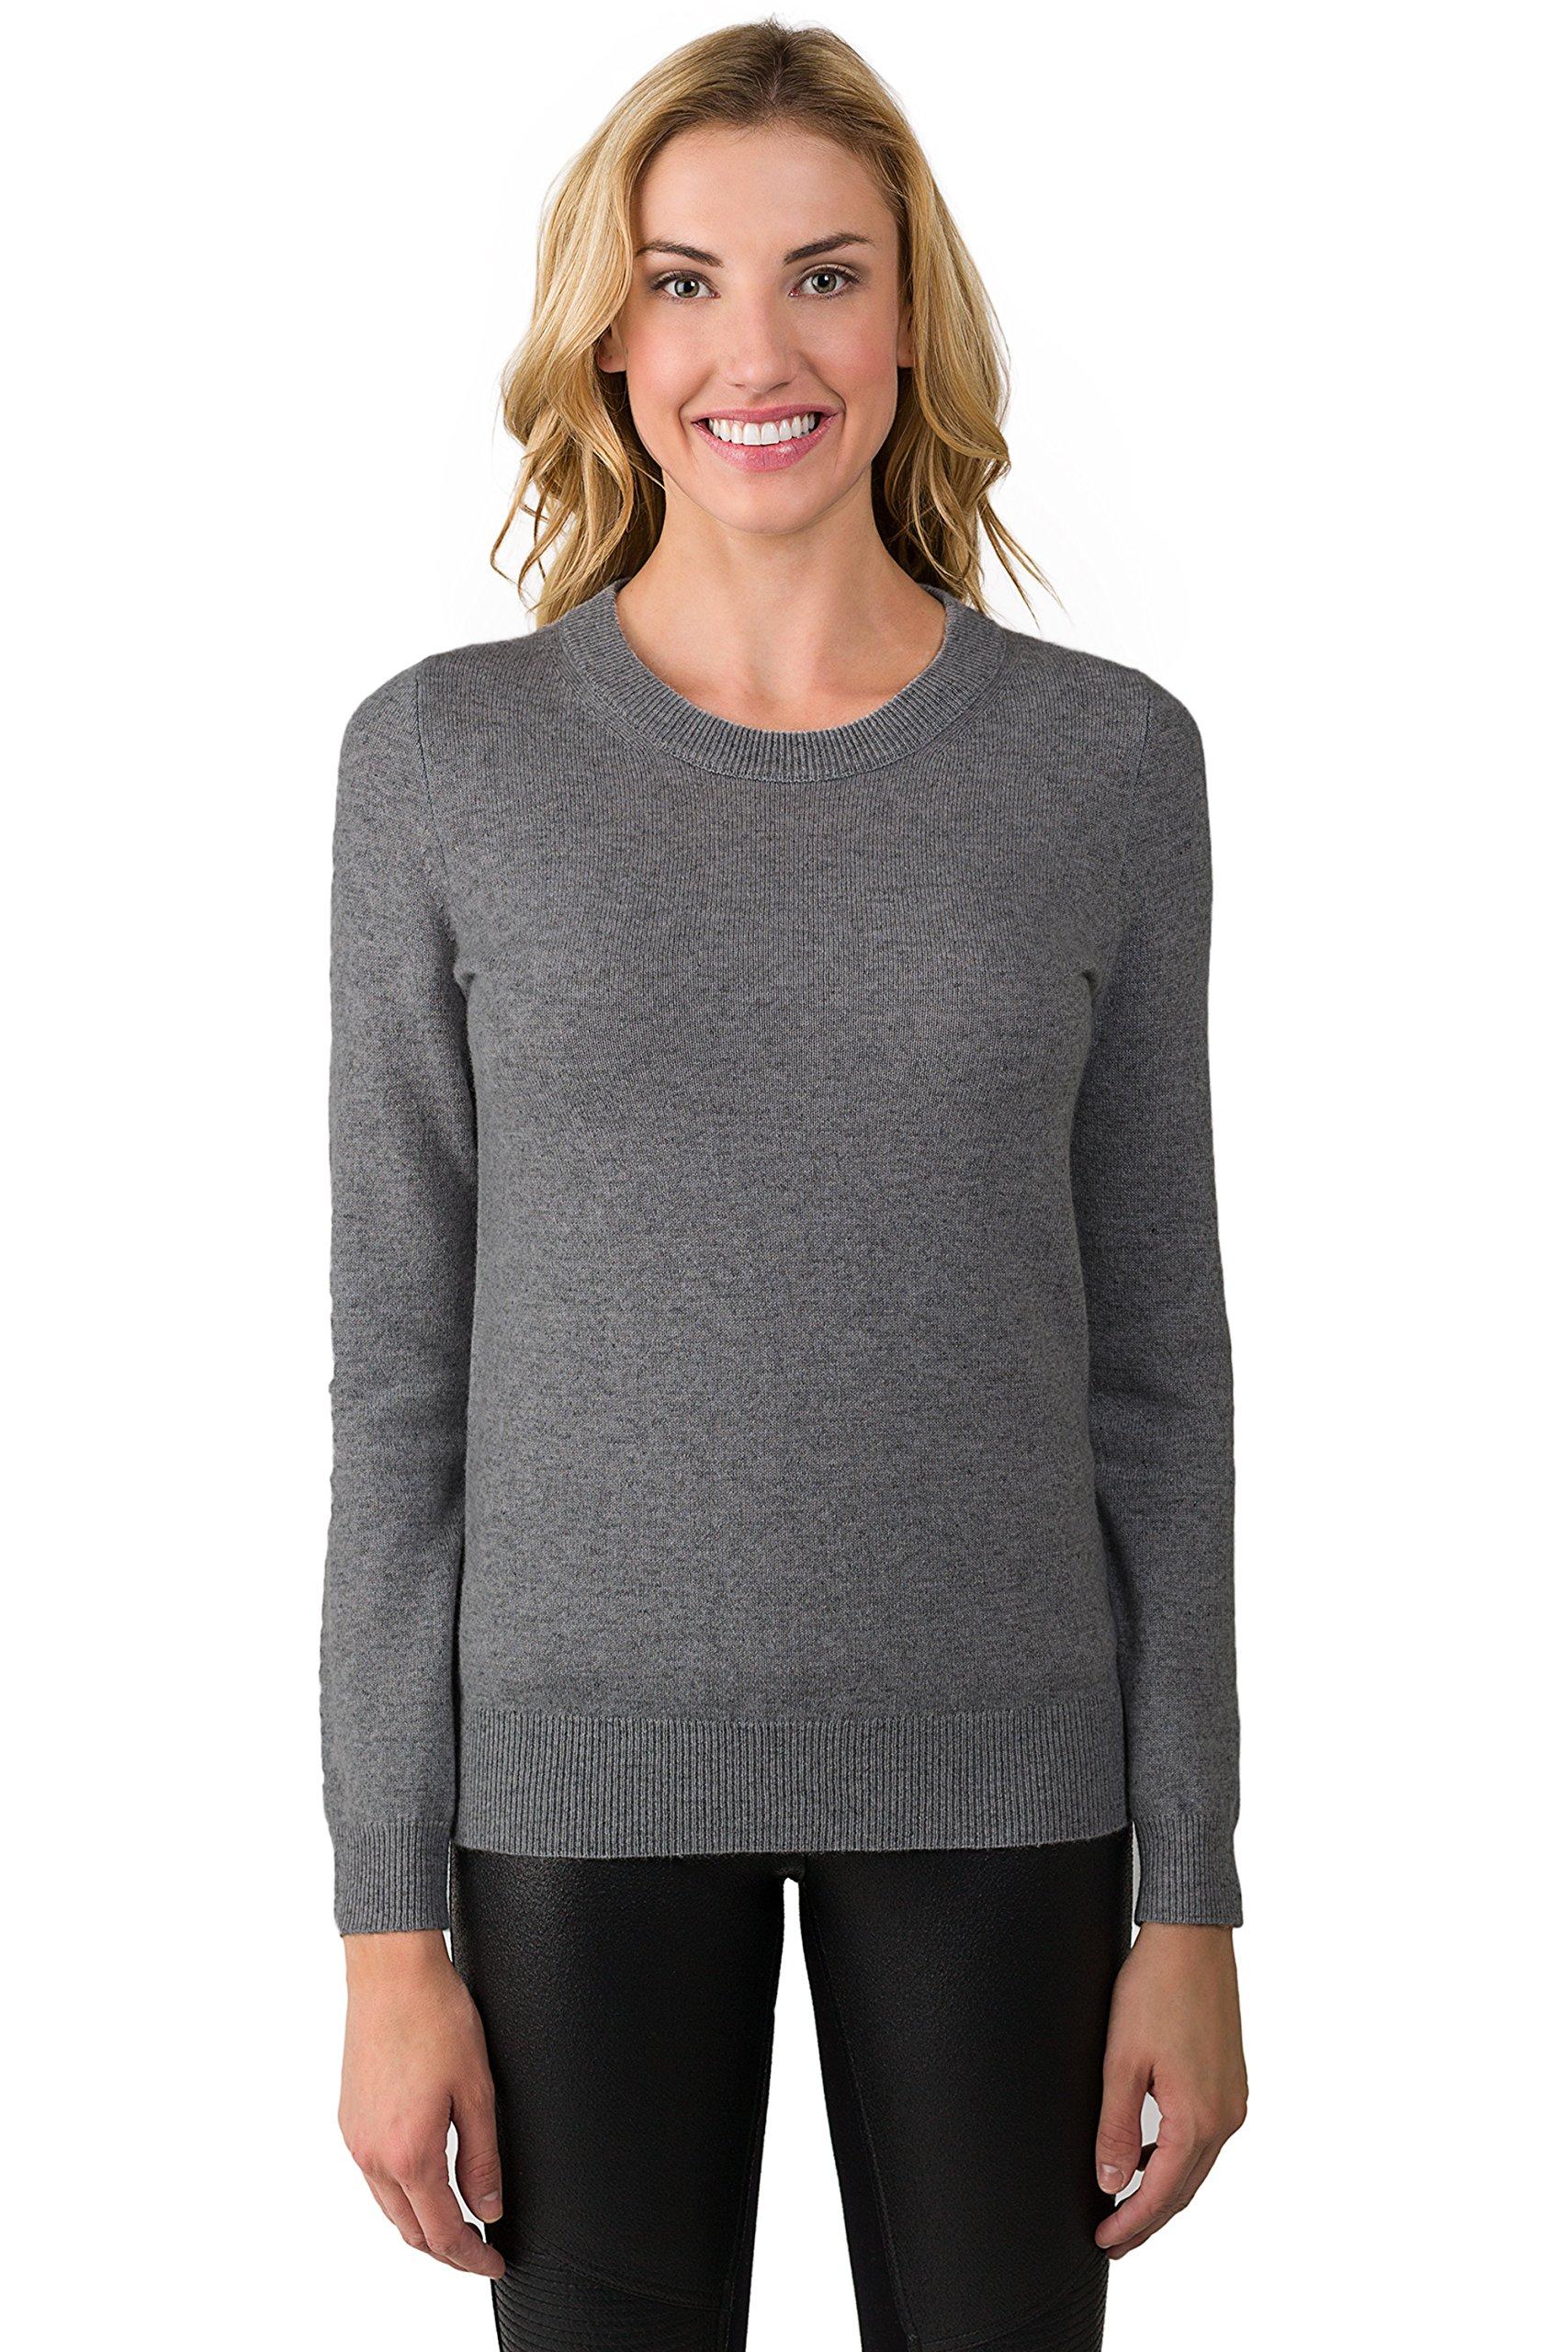 JENNIE LIU Women's 100% Pure Cashmere Long Sleeve Crew Neck Sweater (M, Charcoal)